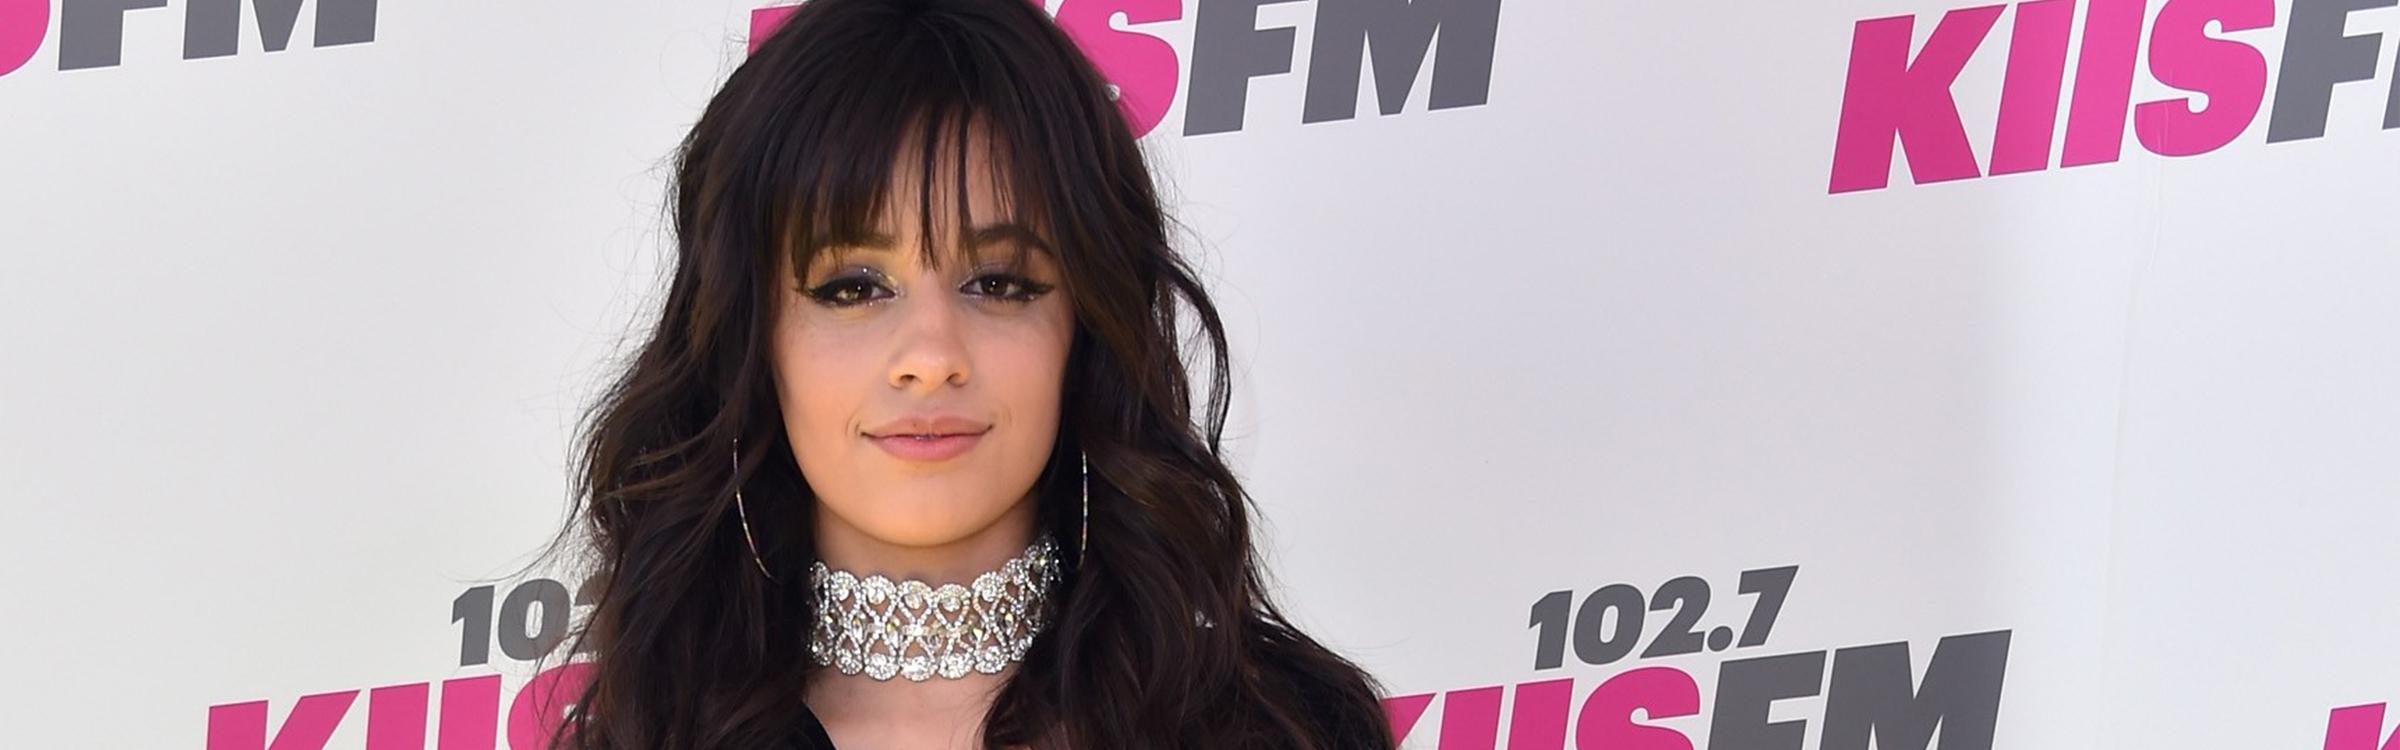 Camila major header